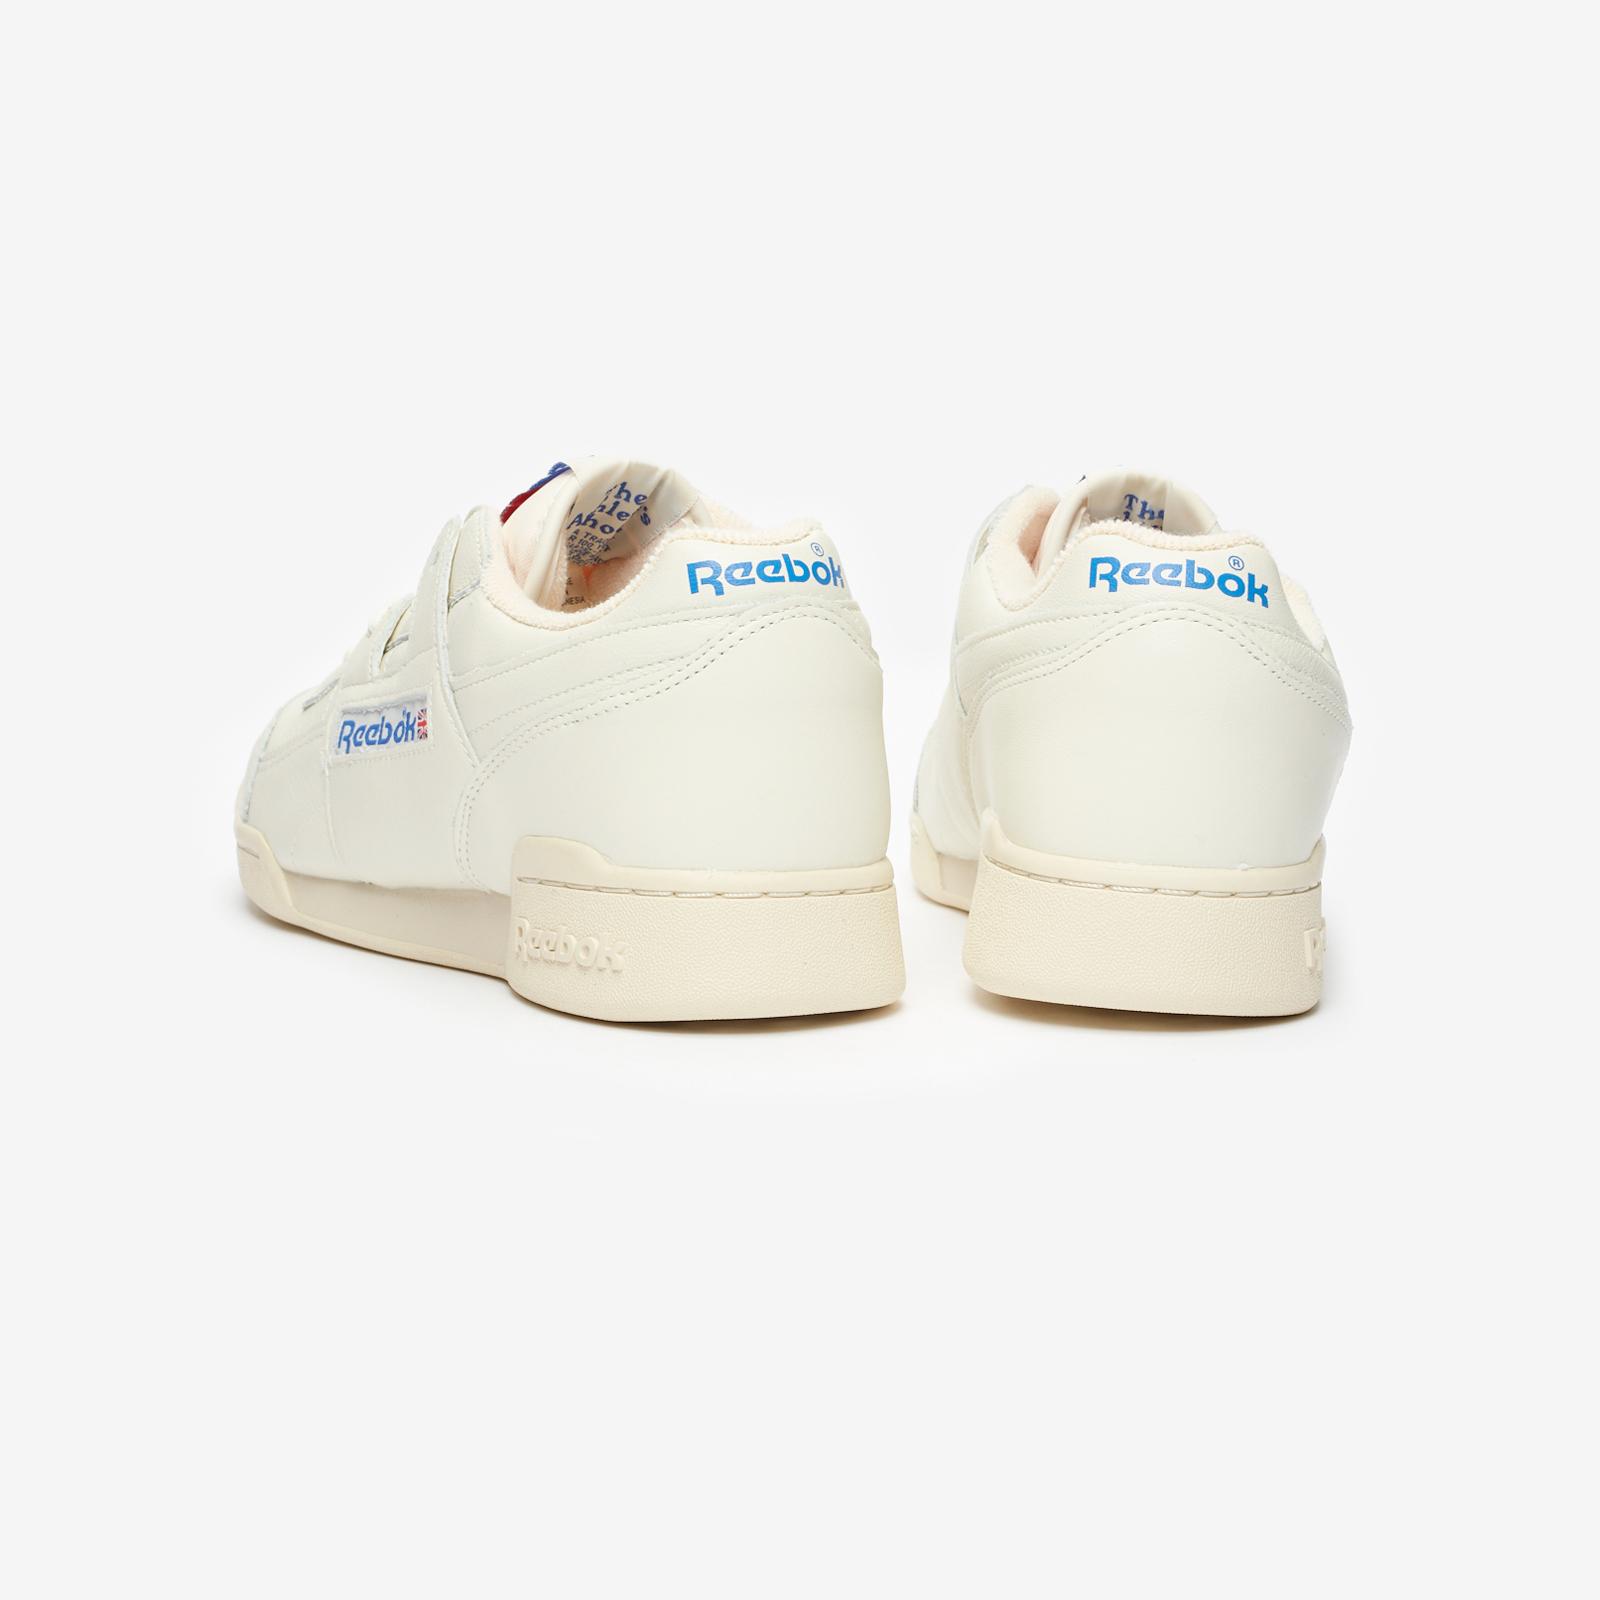 Reebok Workout Plus 1987 TV - Dv6435 - SNS I Sneakers & Streetwear online  seit 1999